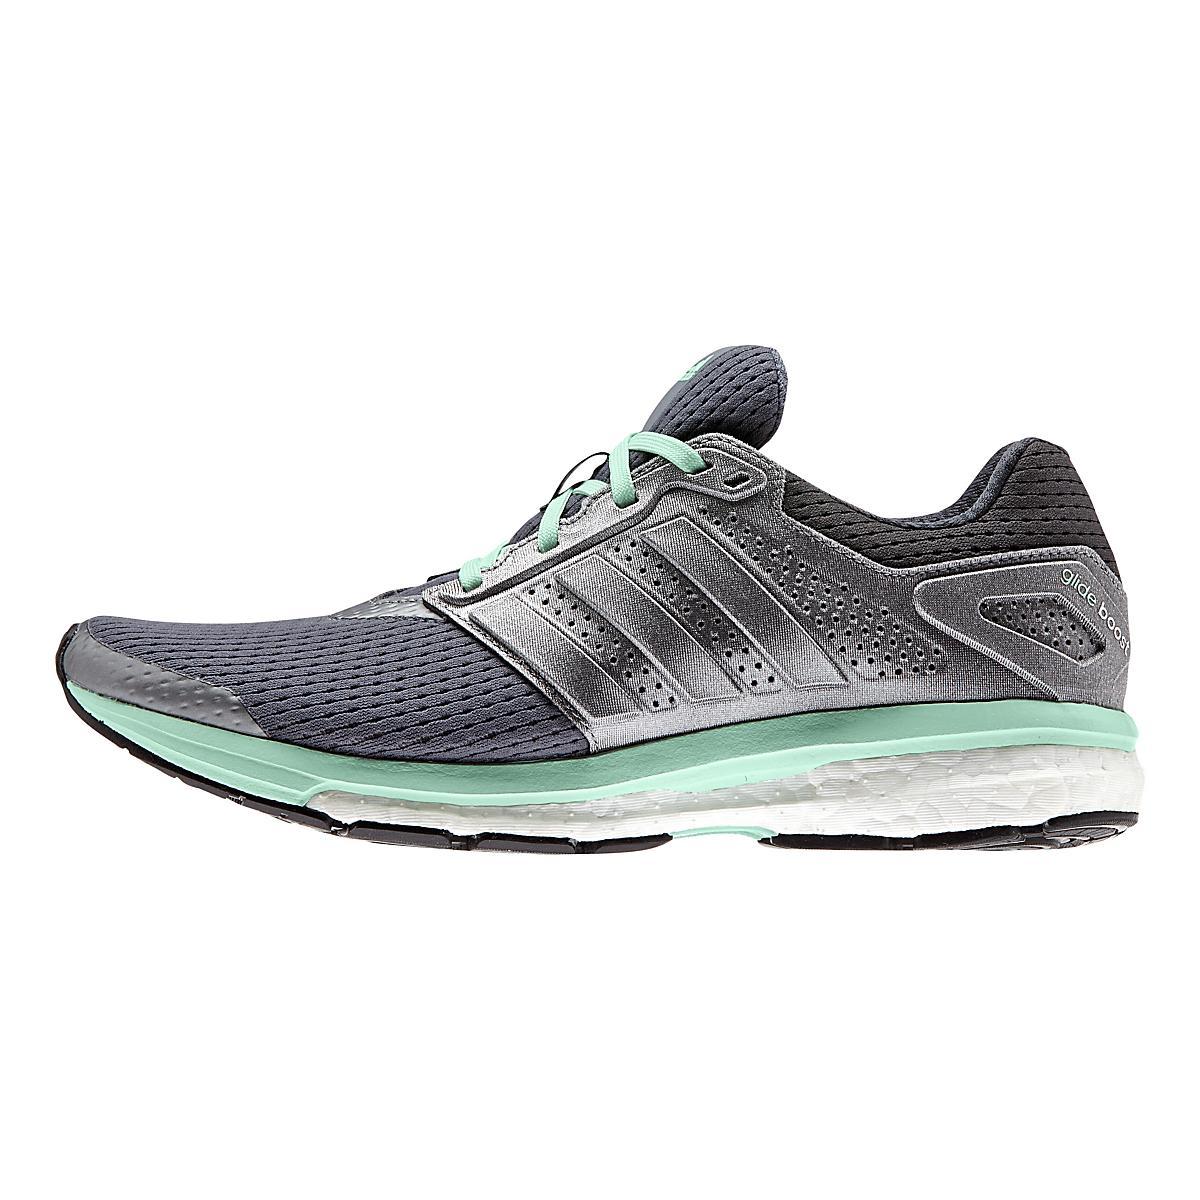 b7b247f1c Womens adidas Supernova Glide 7 Boost Running Shoe at Road Runner Sports